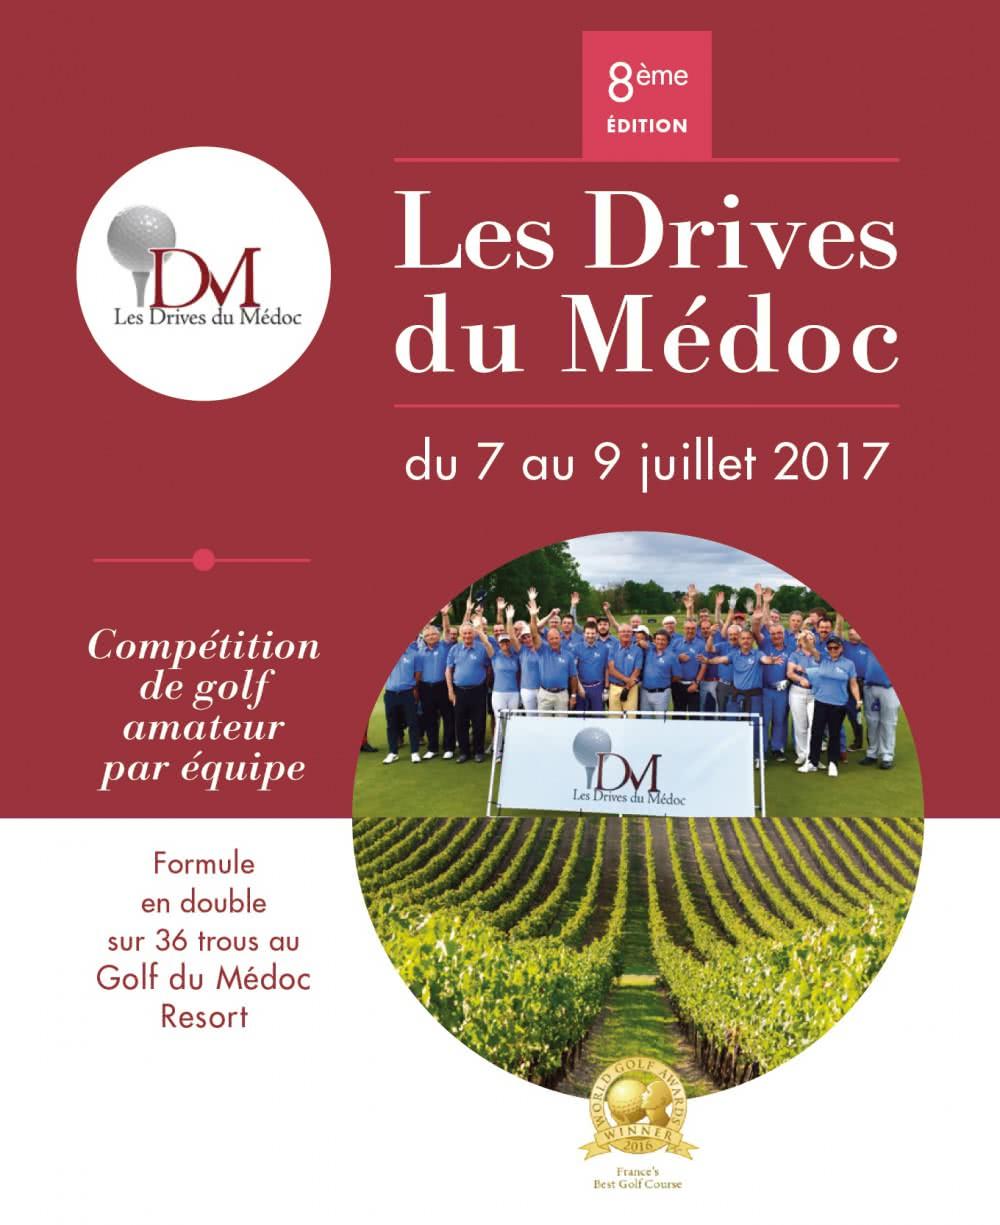 """drive-du-medoc-2017.jpg"""